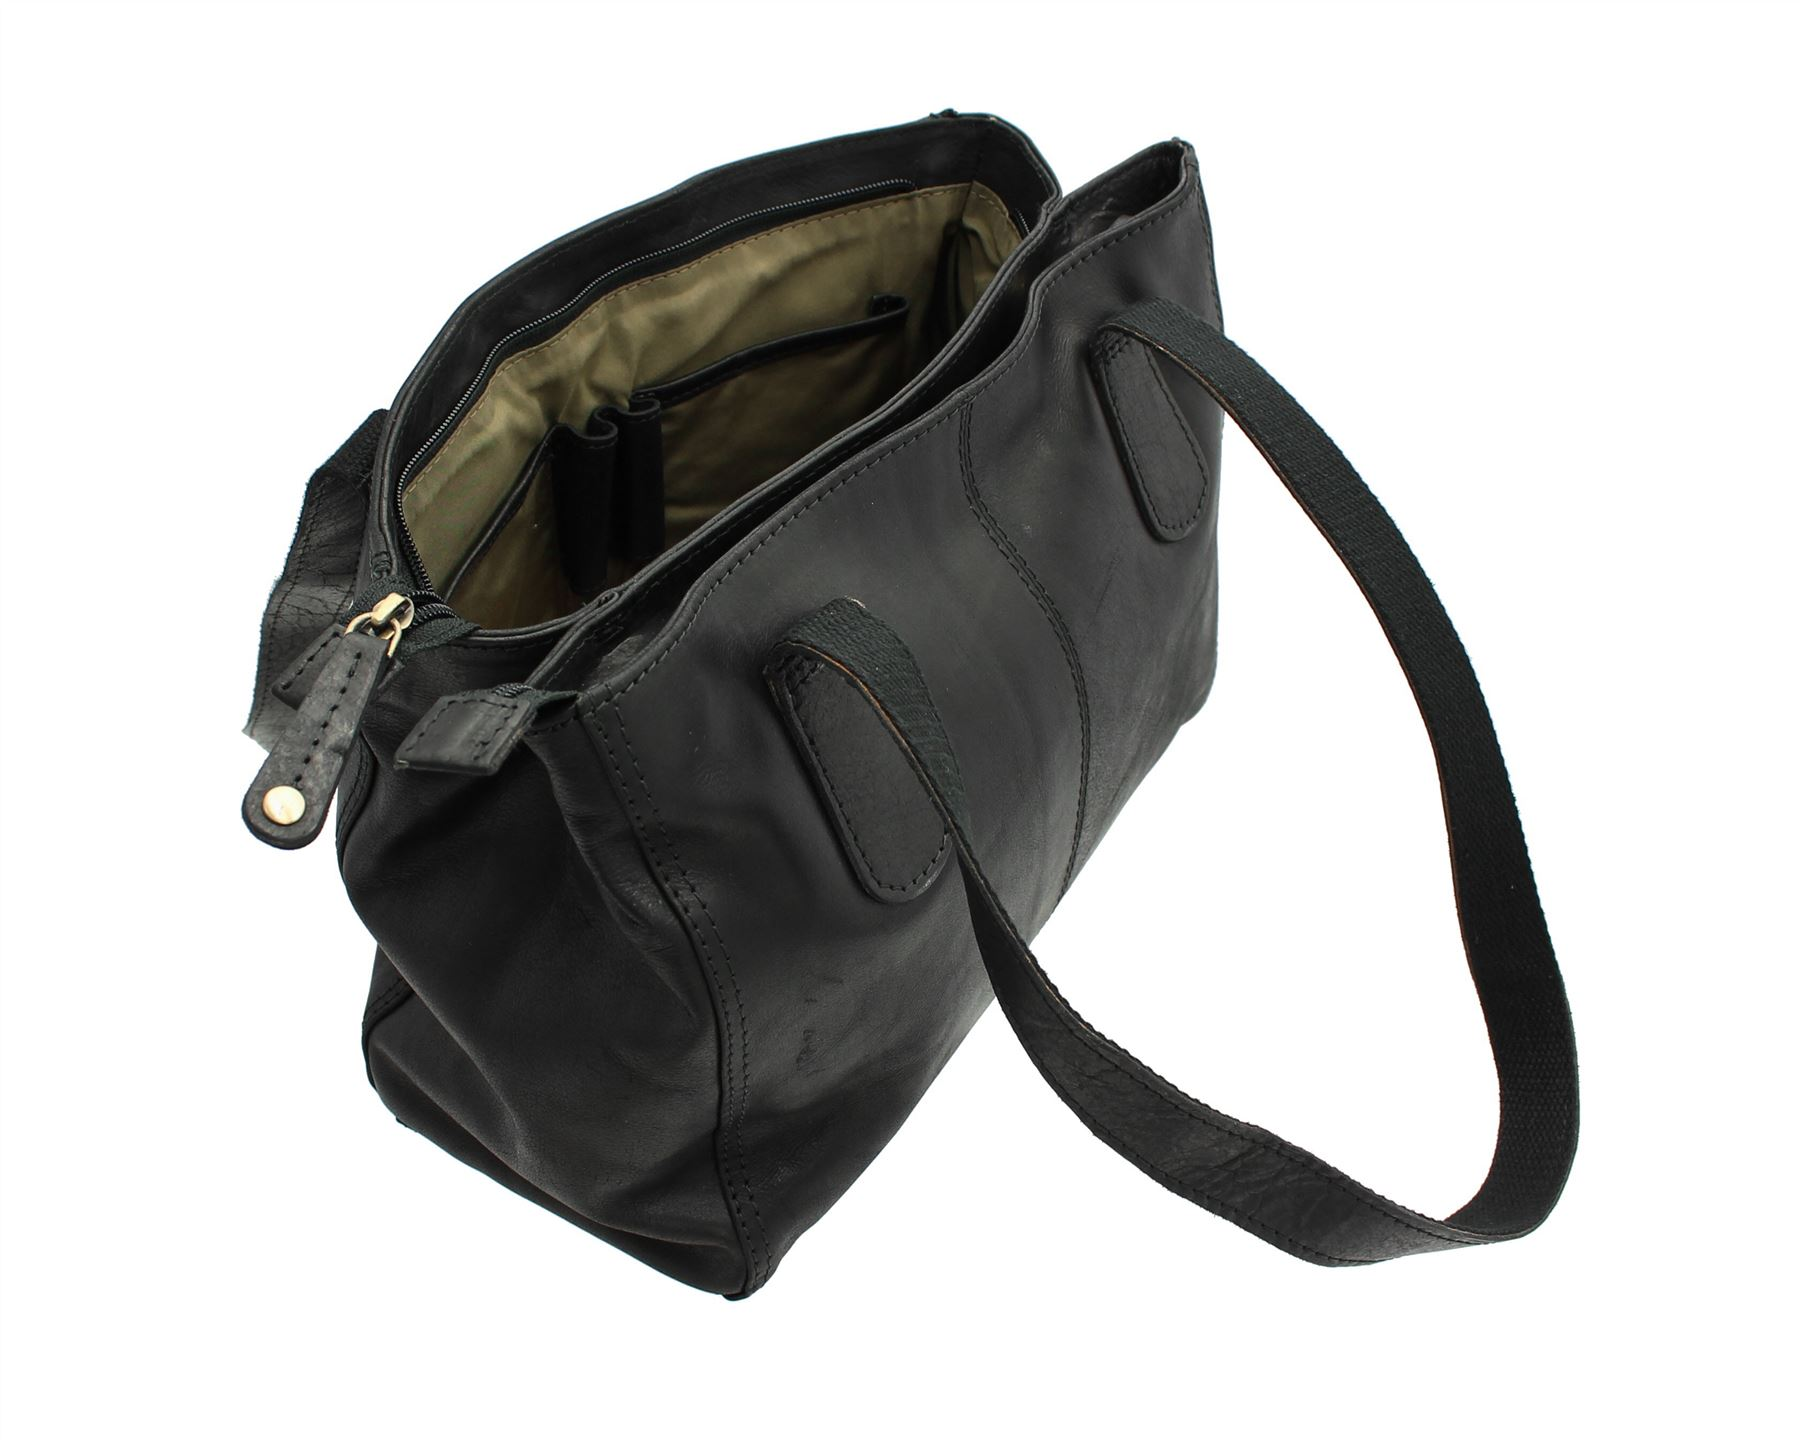 PRINCETON Bolla Bags New England Collection Shoulder Bag